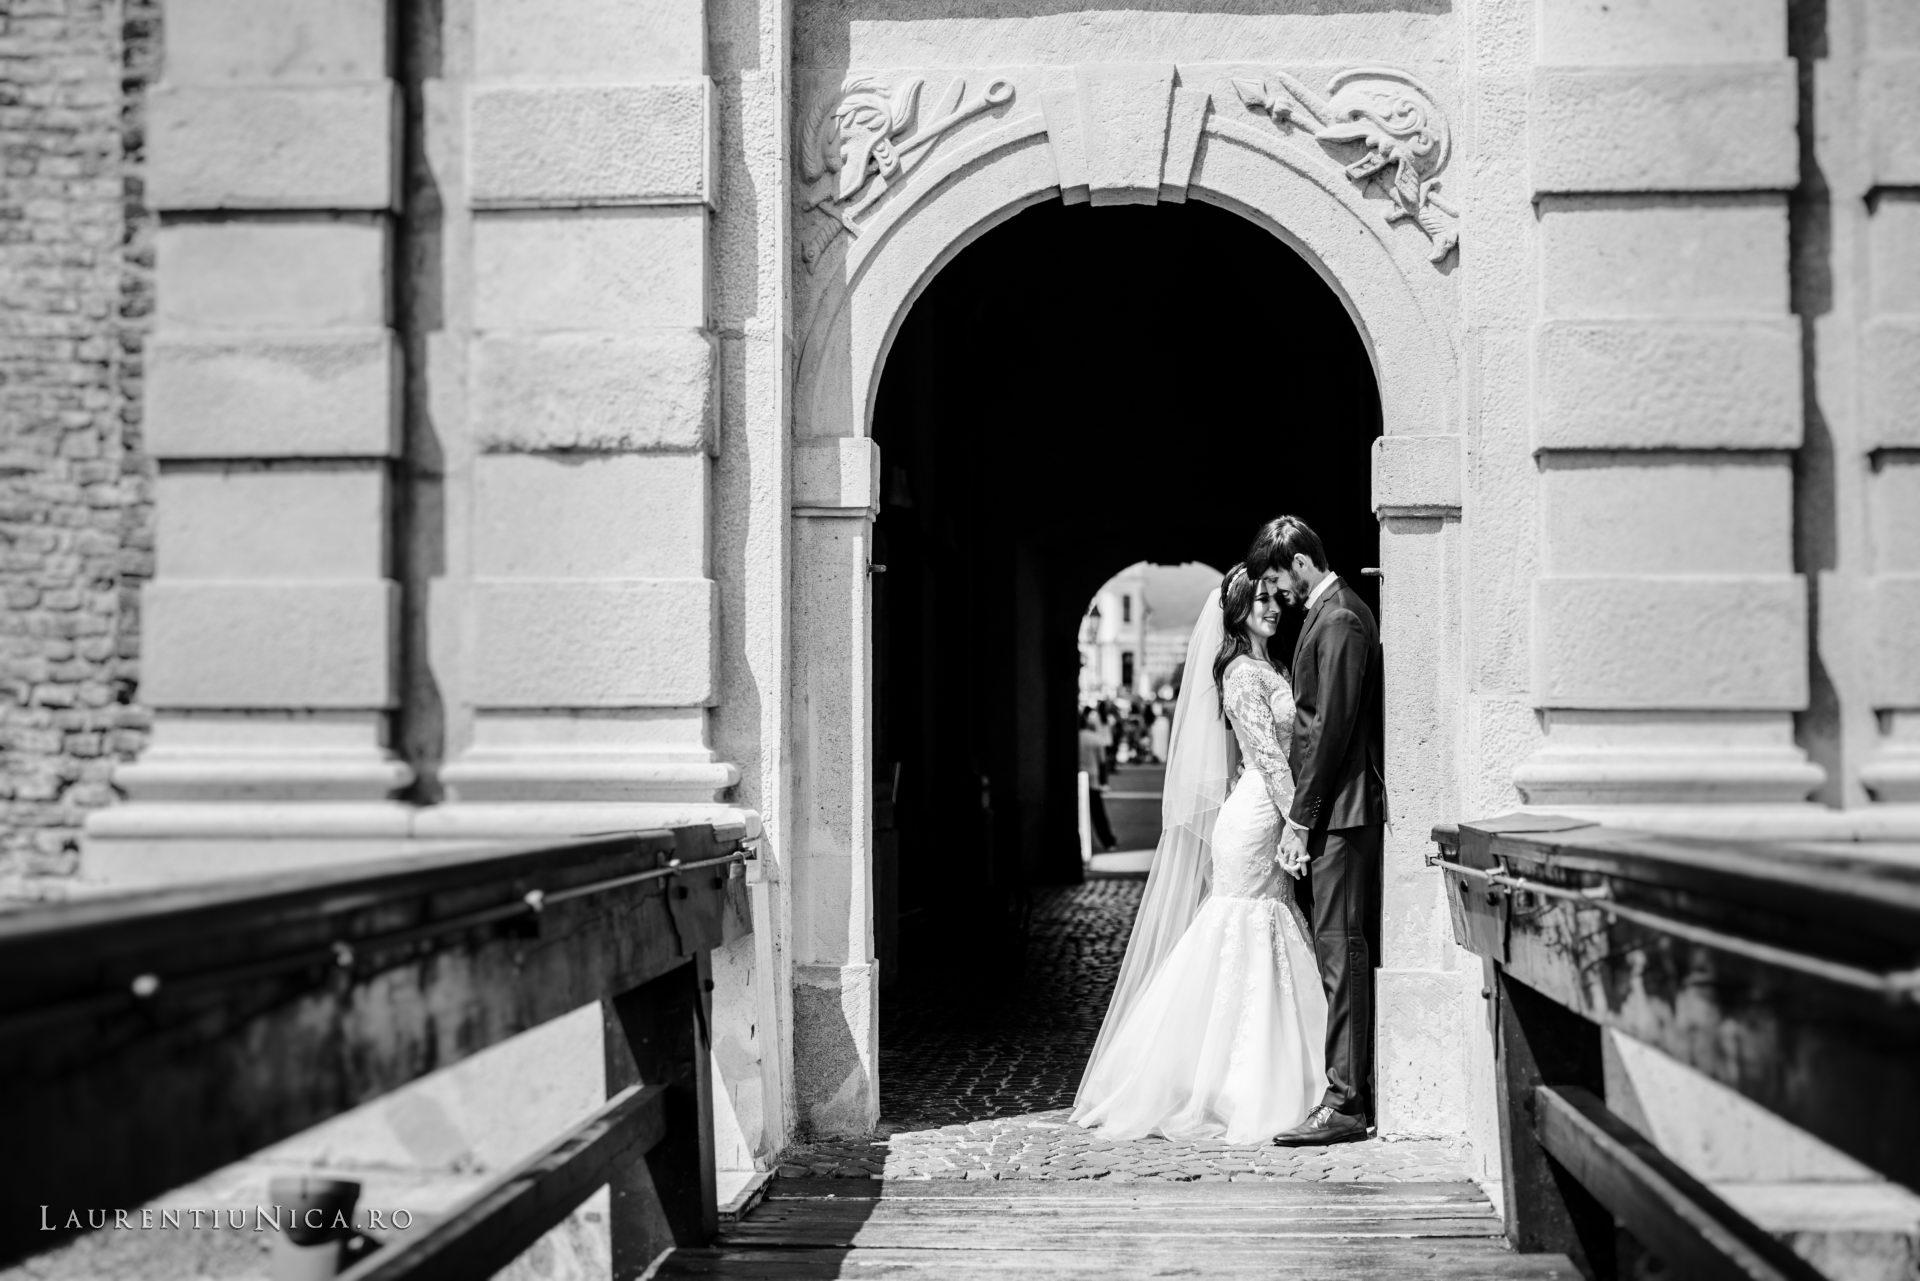 cristina_si_ovidiu-after-wedding-alba-iulia_fotograf_laurentiu_nica_03